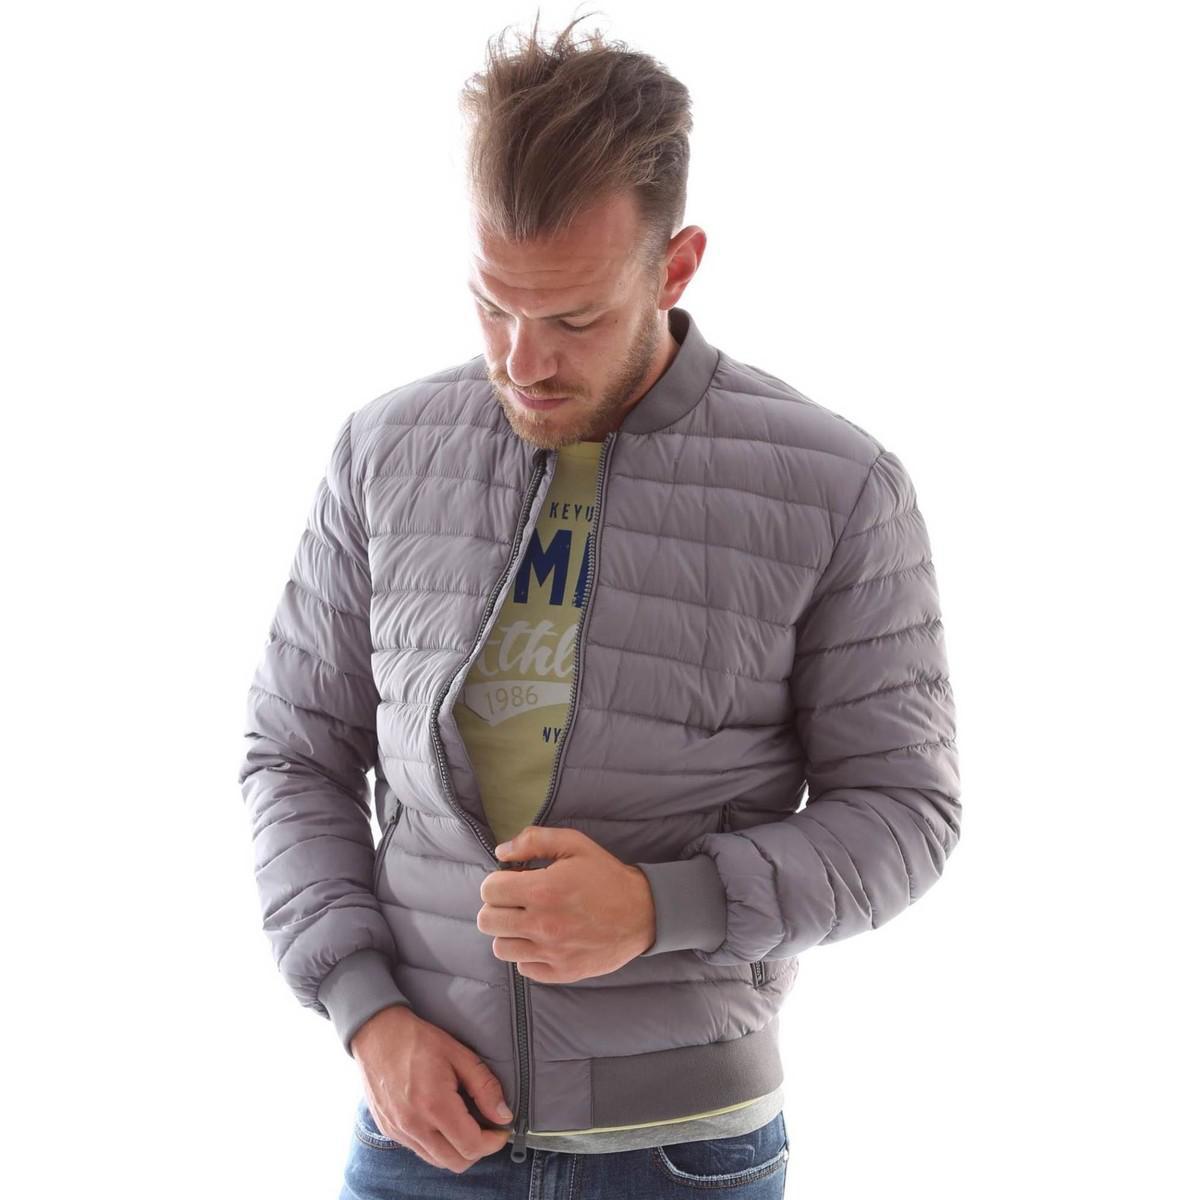 6bfe21e4eff Geox M6225e T1816 Down Jacket Man Grey Men's Jacket In Grey in Gray ...